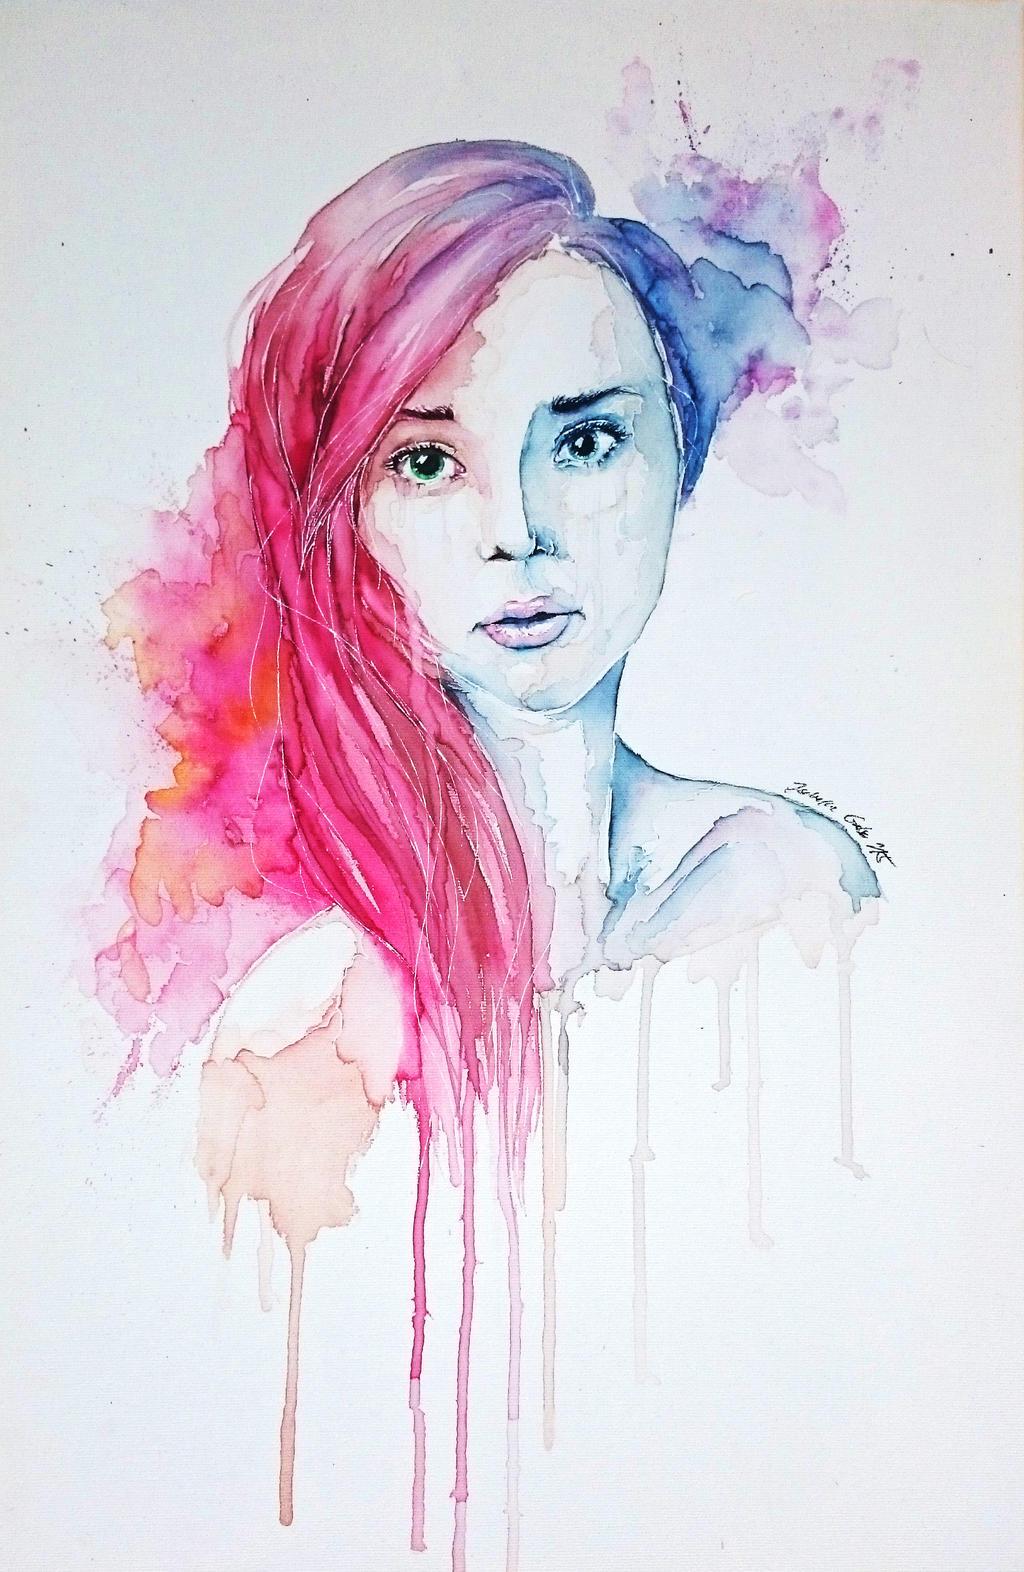 Bright Eyes by Jizebelle